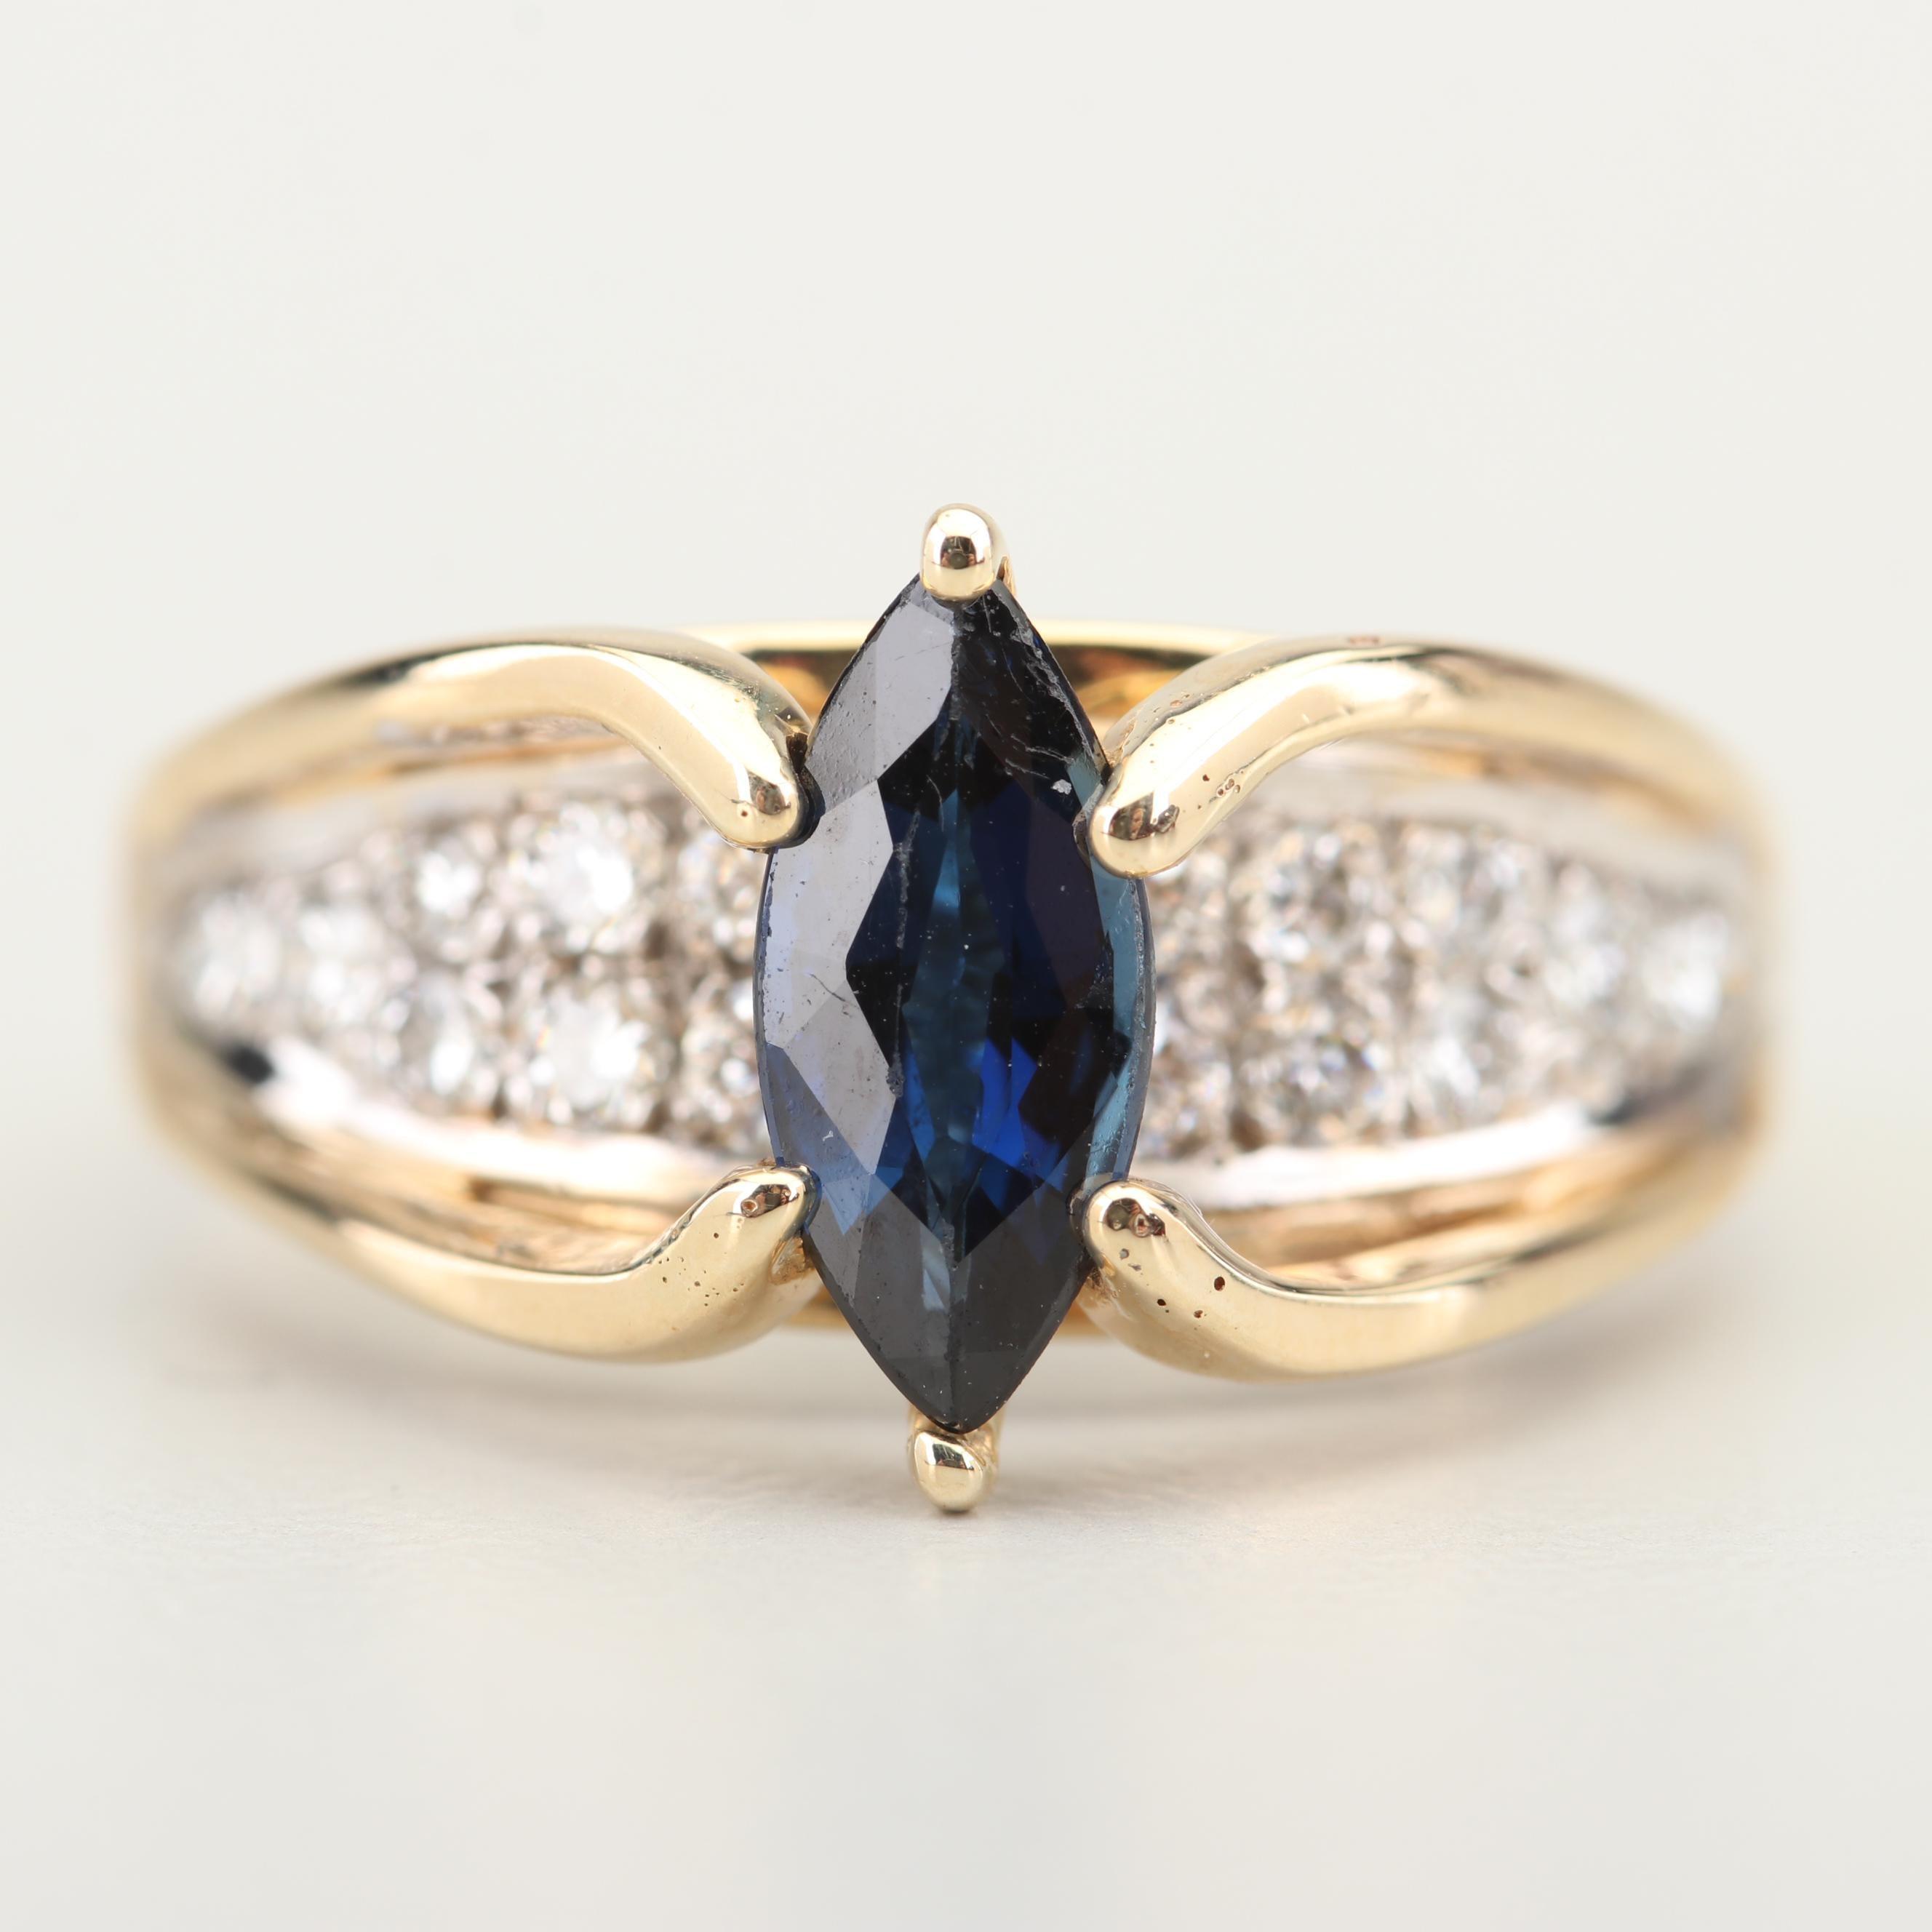 14K Yellow Gold 1.15 CT Sapphire and Diamond Ring